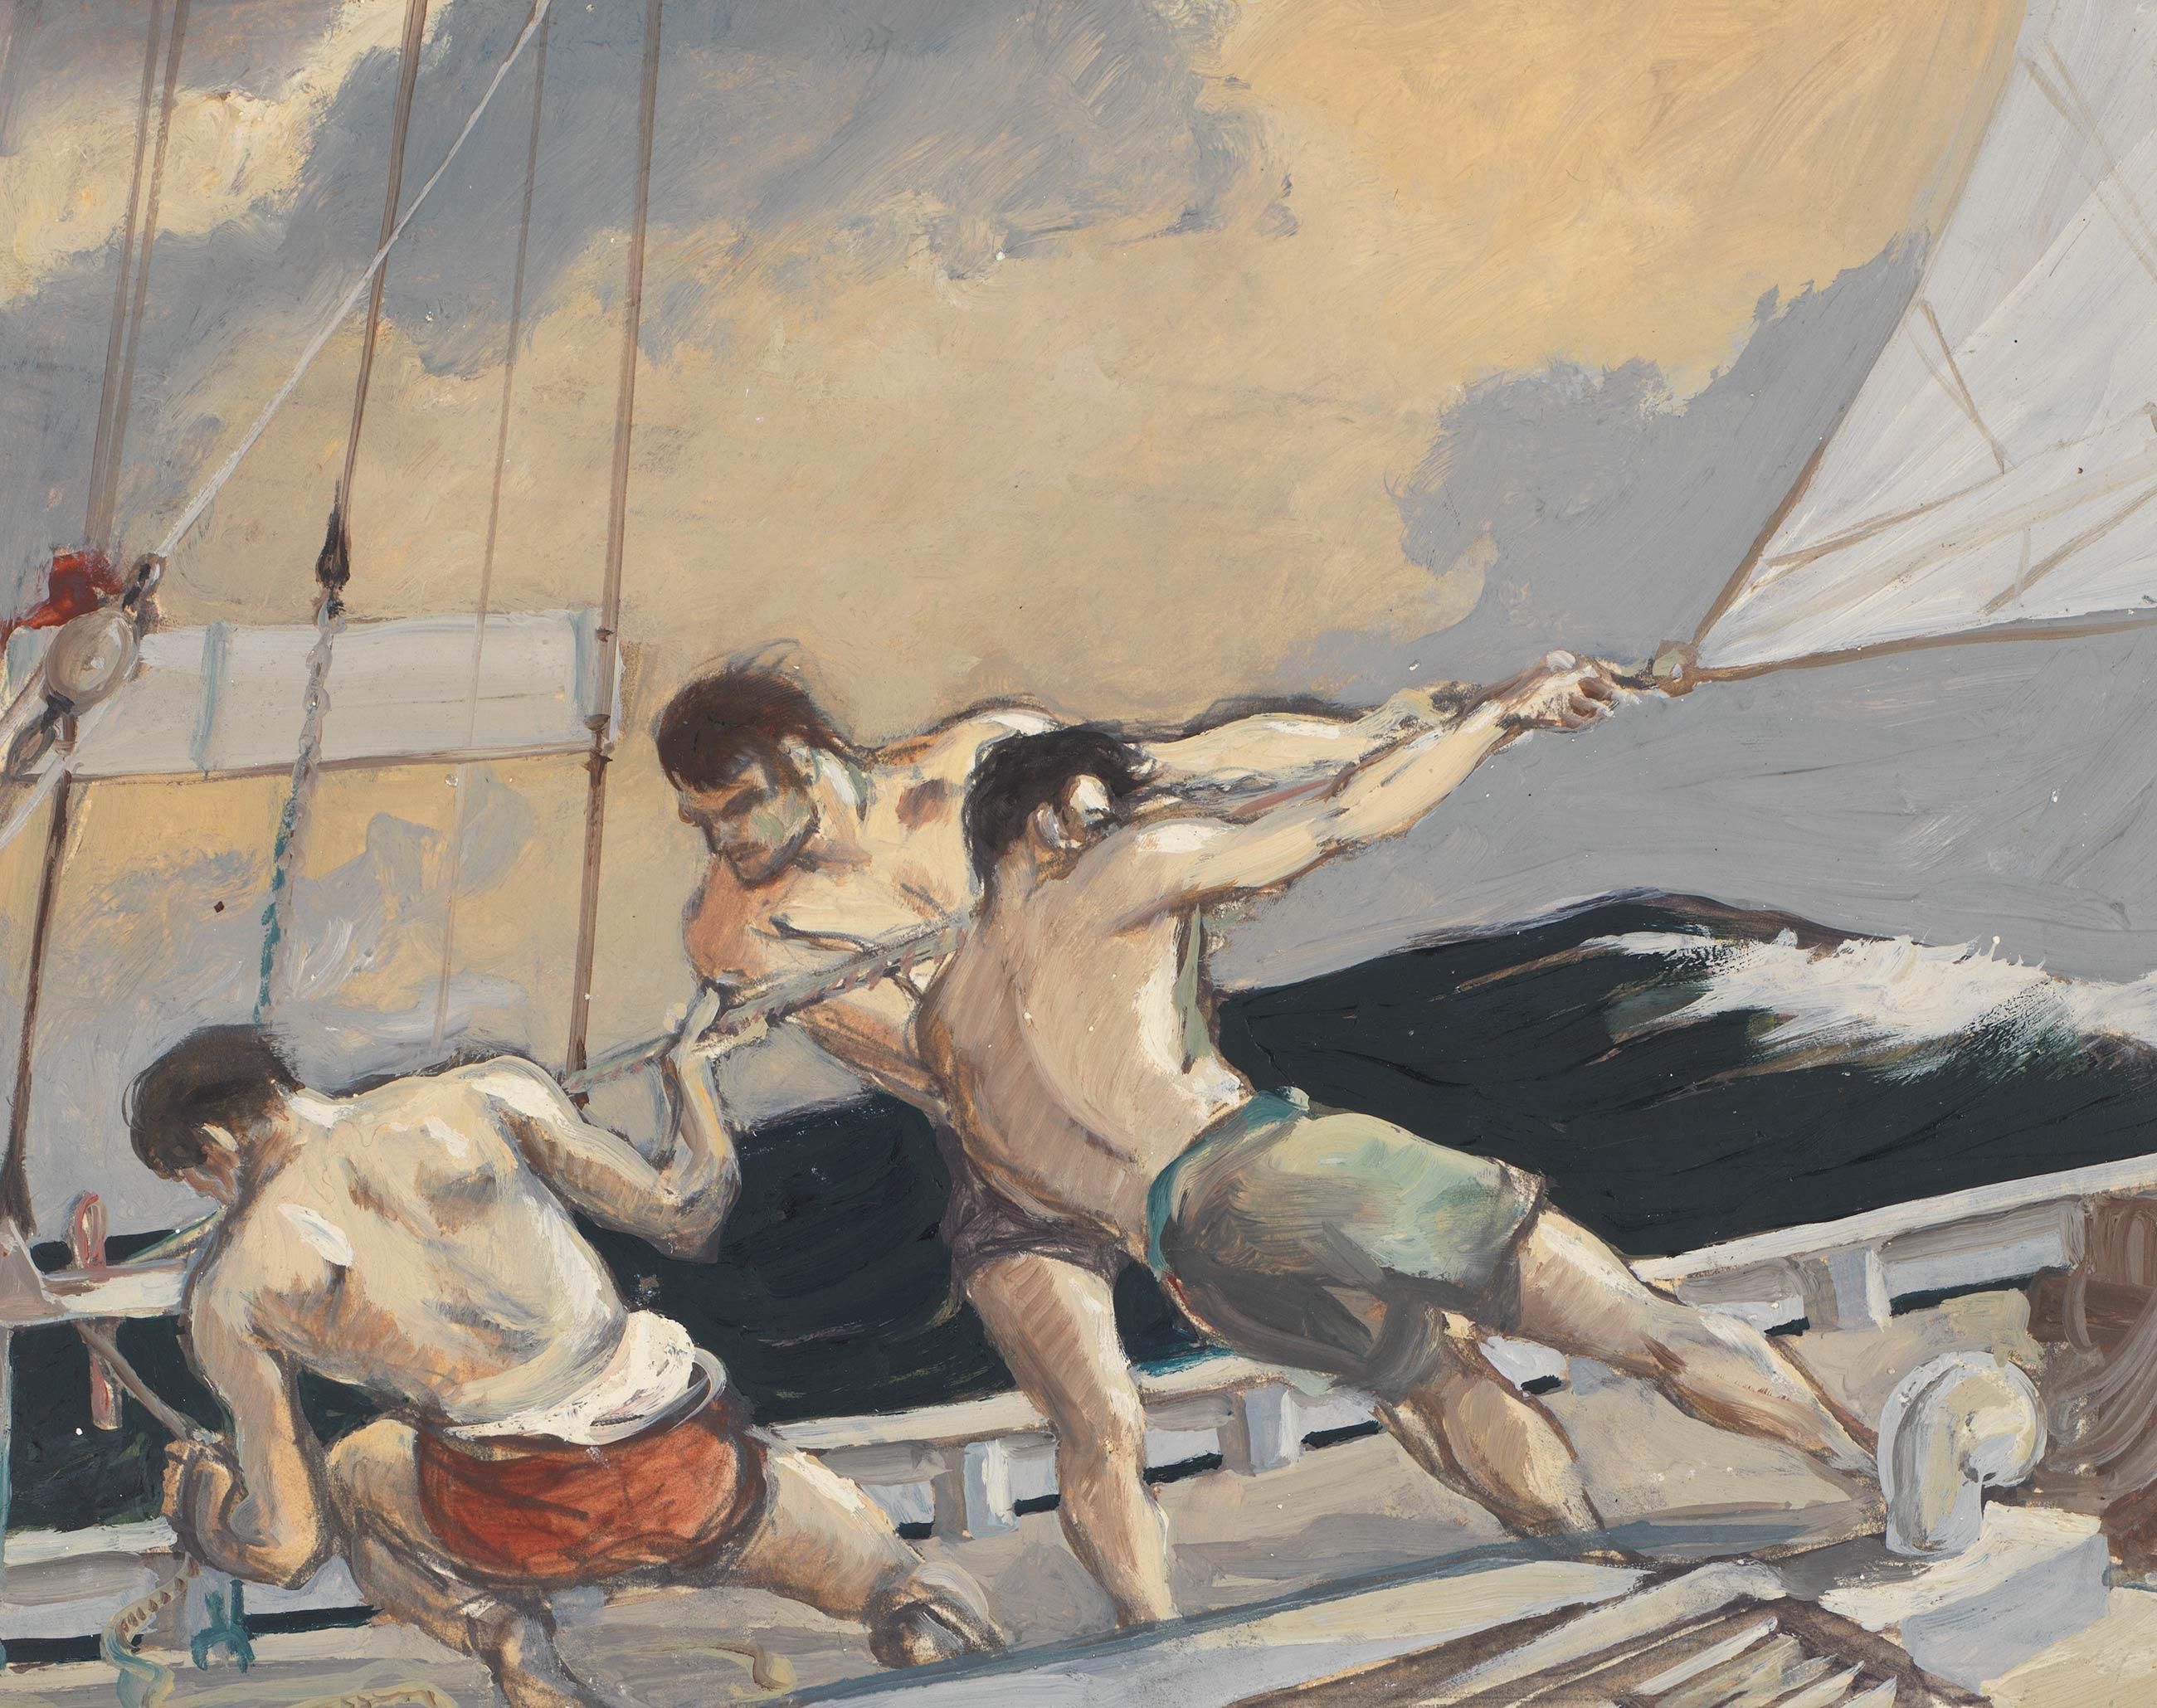 Detail: Sheeting in the spinnaker: Kathleen's voyage, Ascension Island, Receife, Brazil: Jan, Feb, March 1948: Log 7